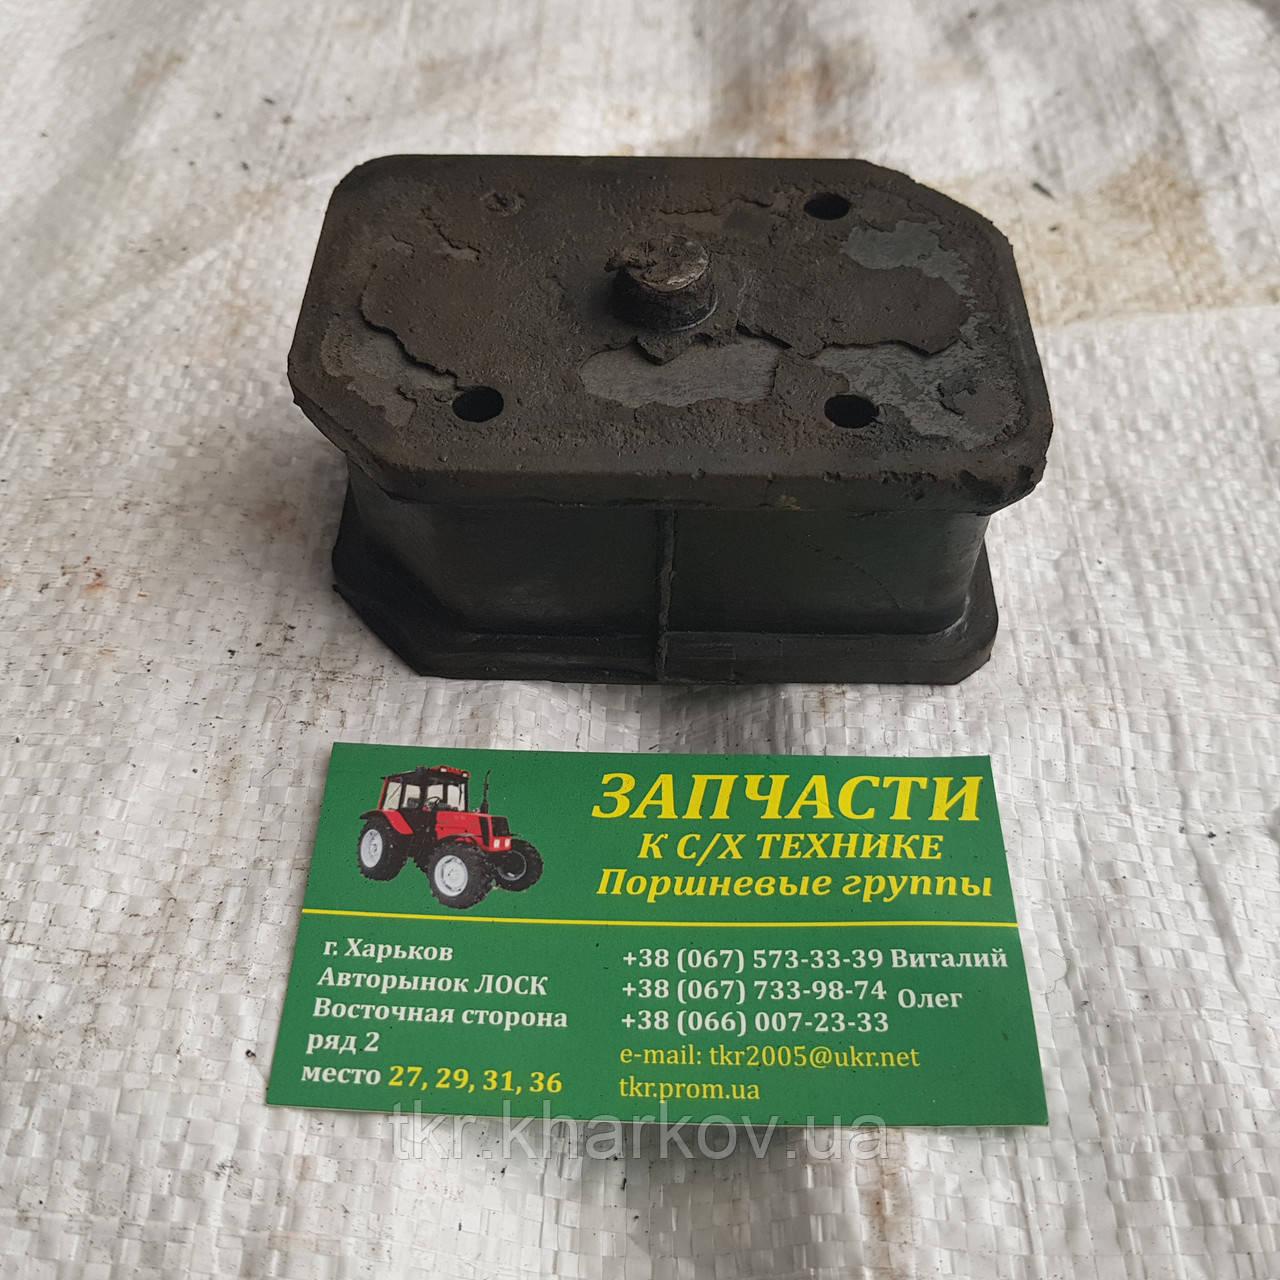 Амортизатор МТЗ двигателя 240-1001025